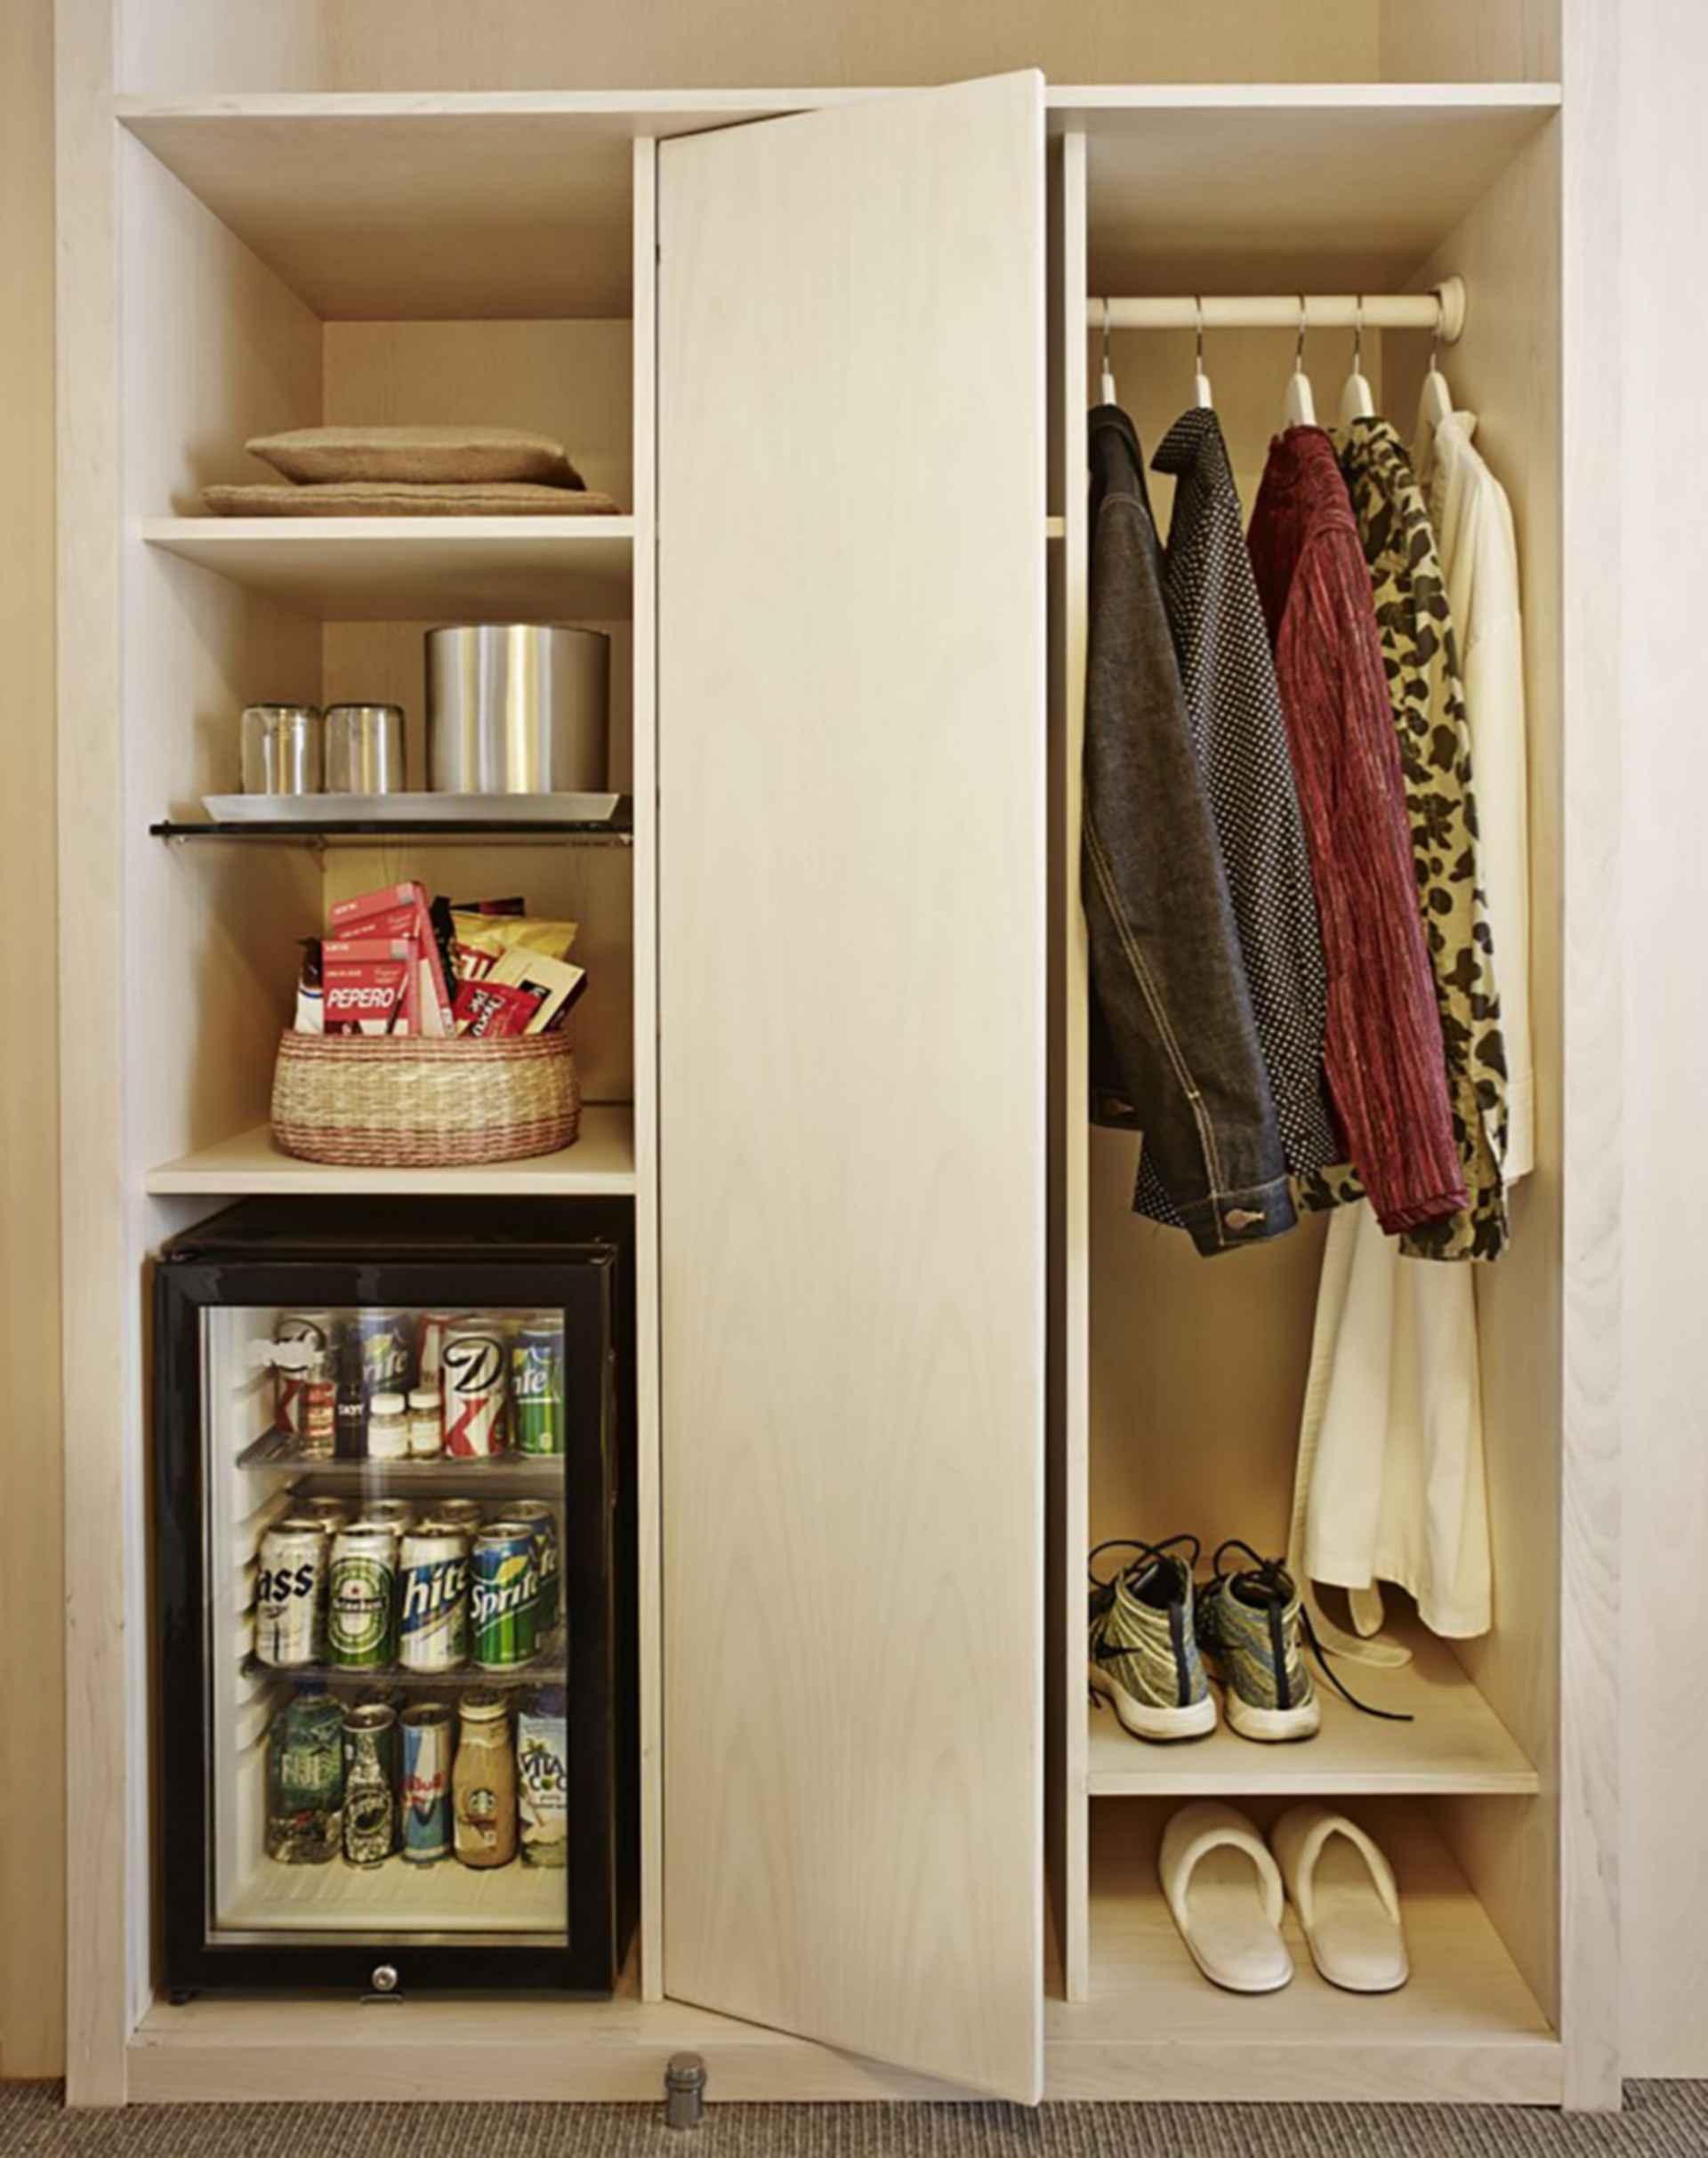 The Line Hotel - Interior/Bedroom Storage